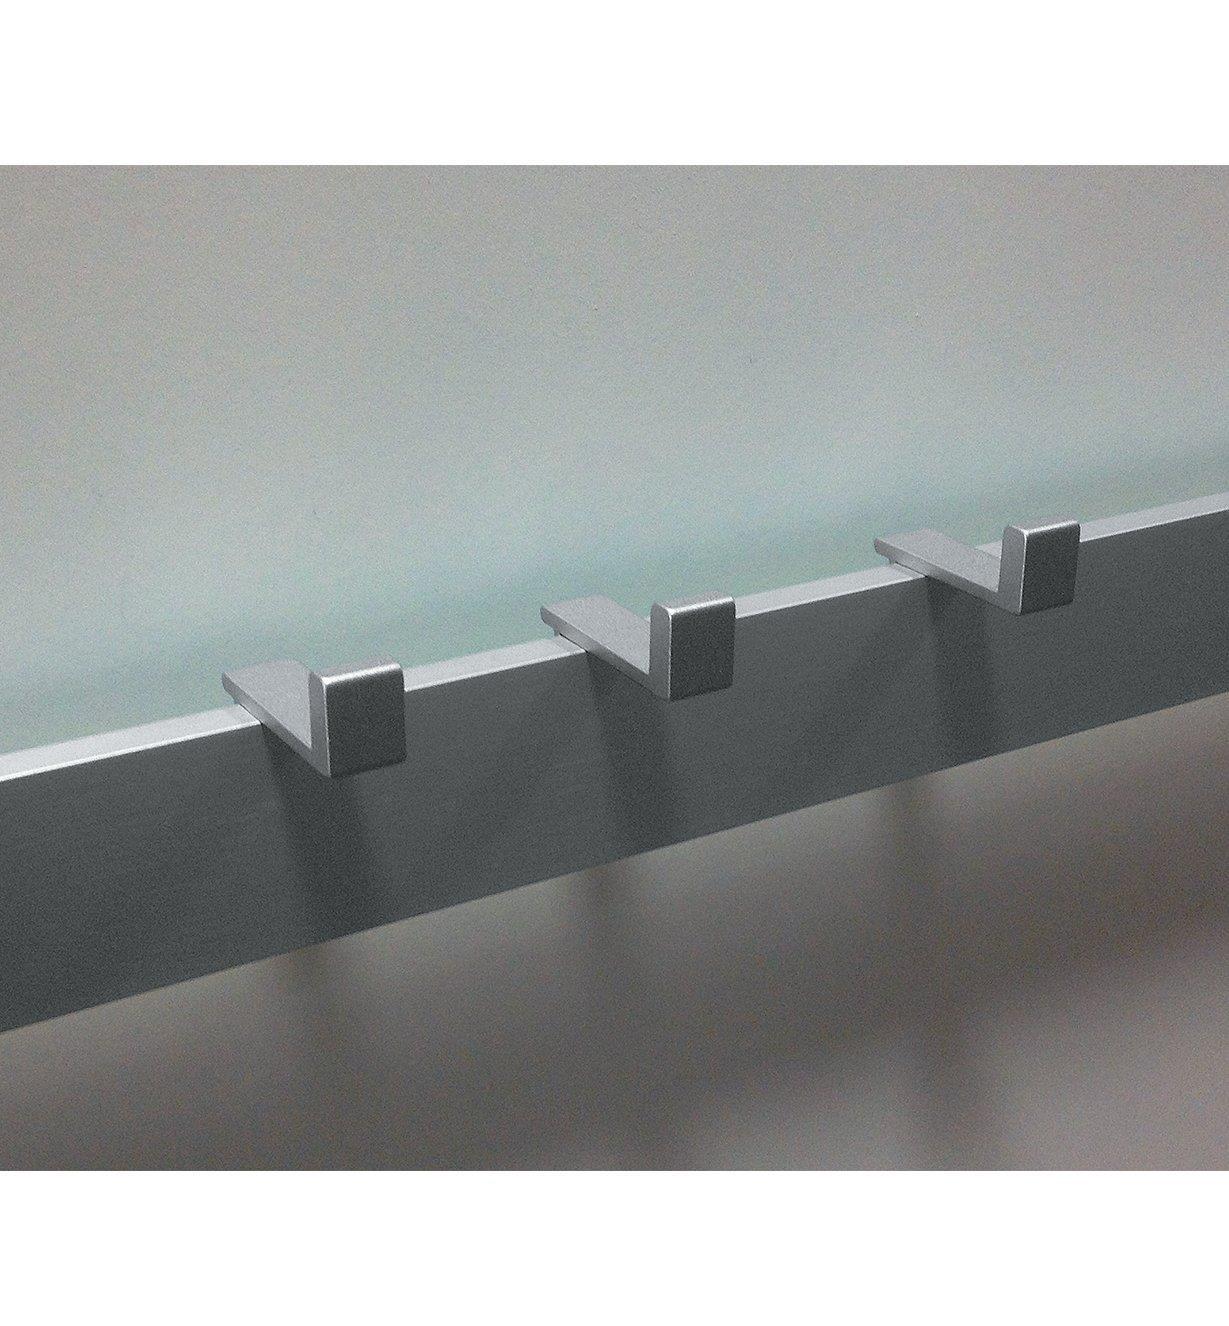 Three rail-mount hooks mounted on a rail on a wall